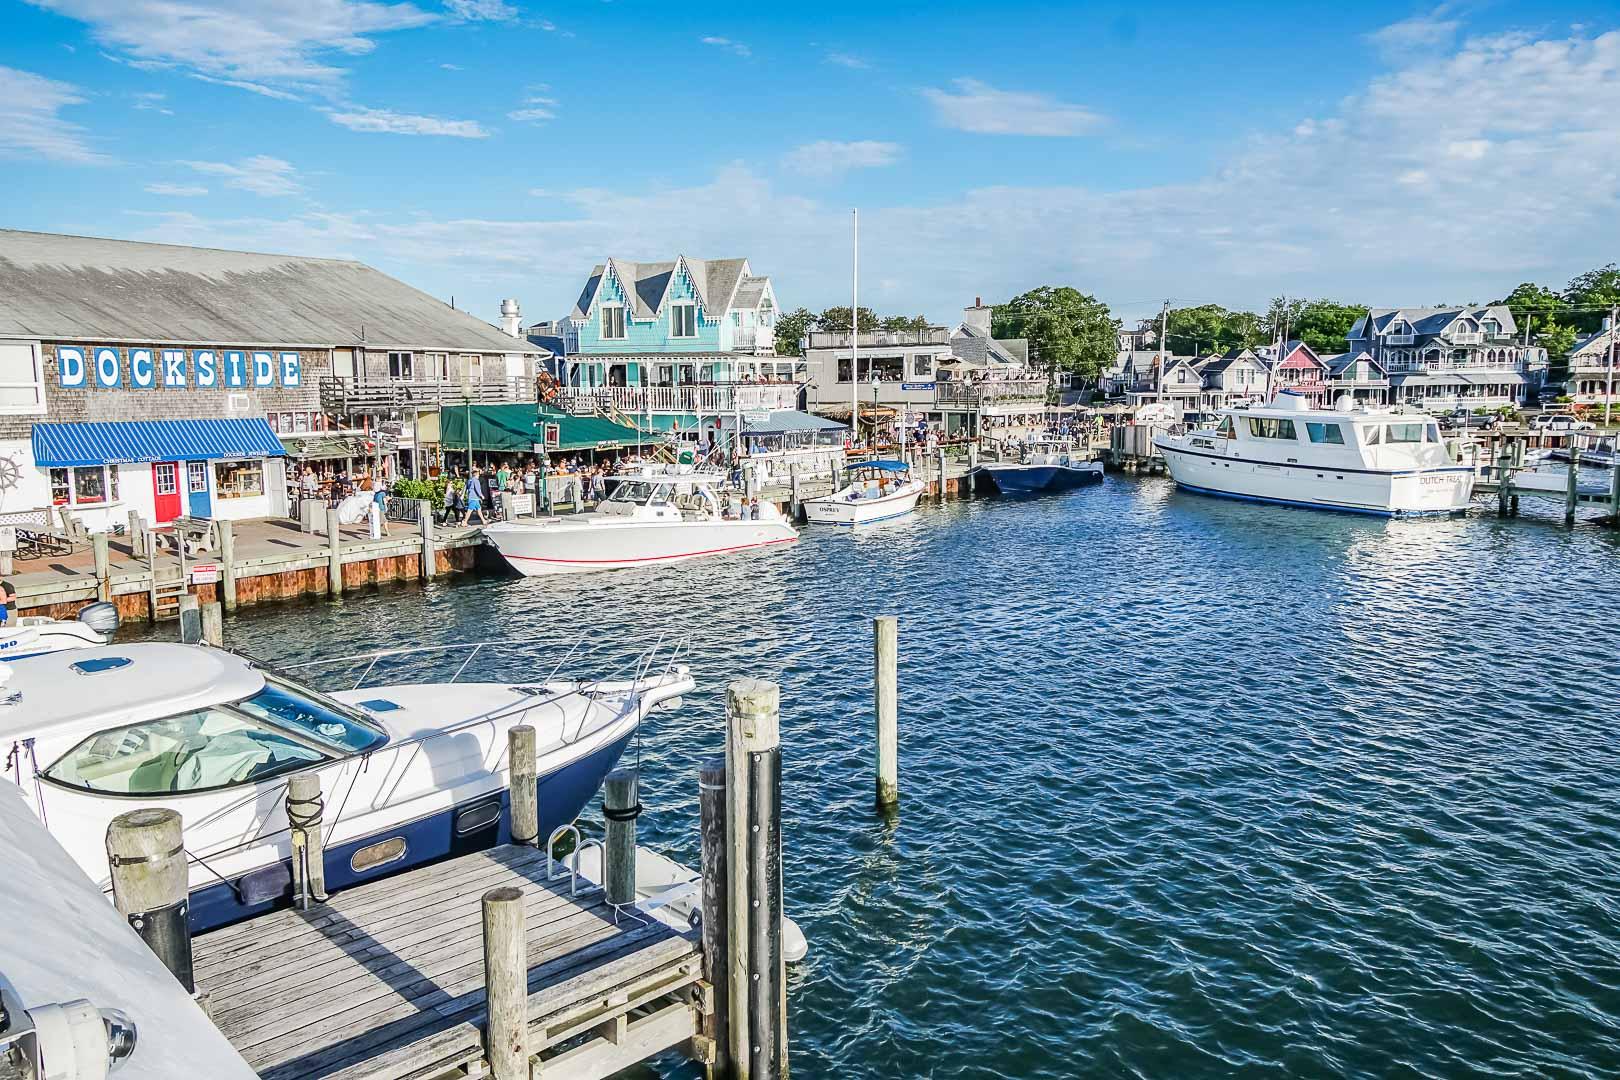 Scenic attractions with boat docks at VRI's Harbor Landing Resort in Massachusetts.